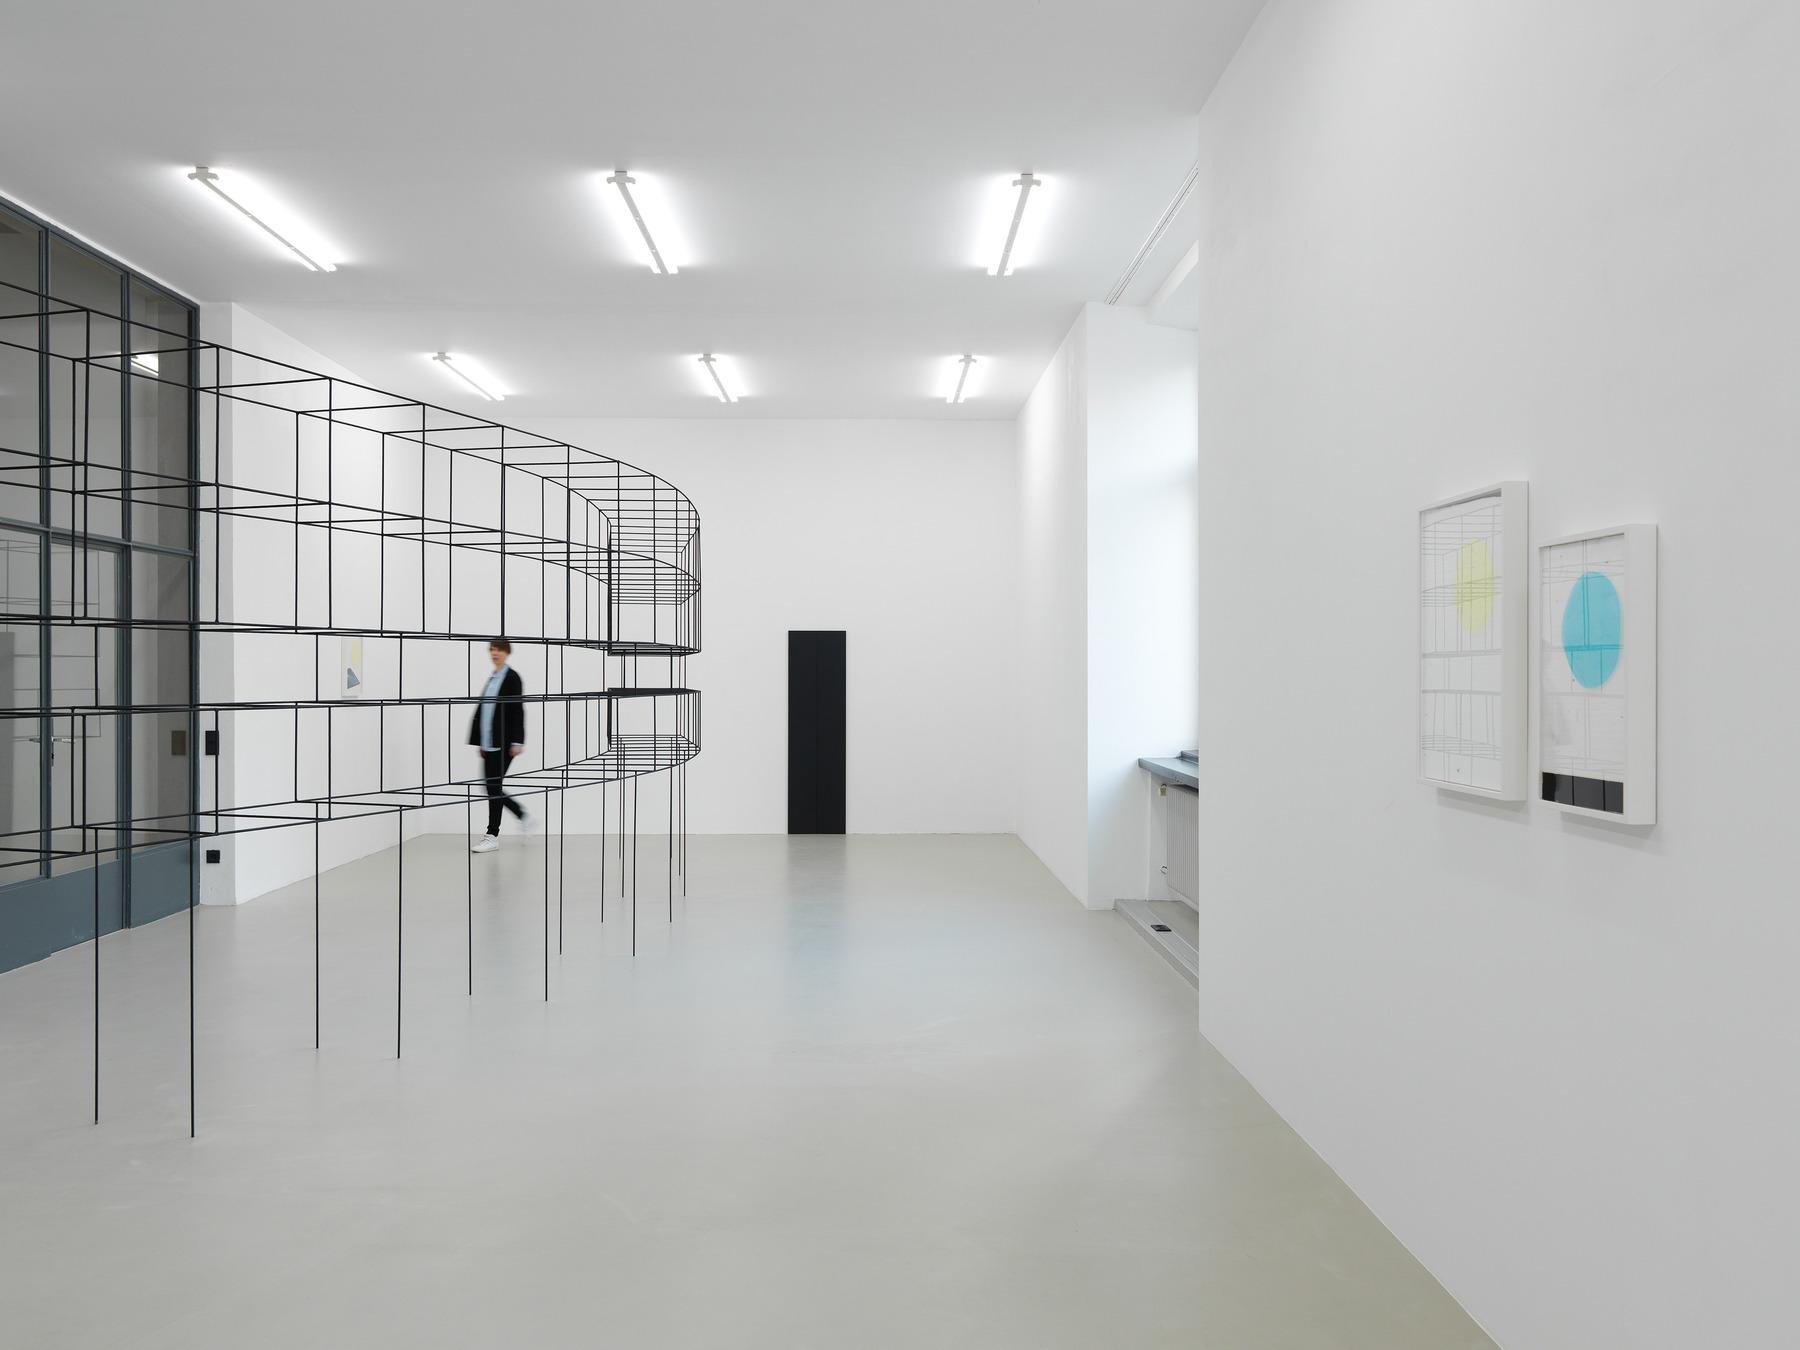 07_Edit Oderbolz_Kunstverein Nürnberg_2017